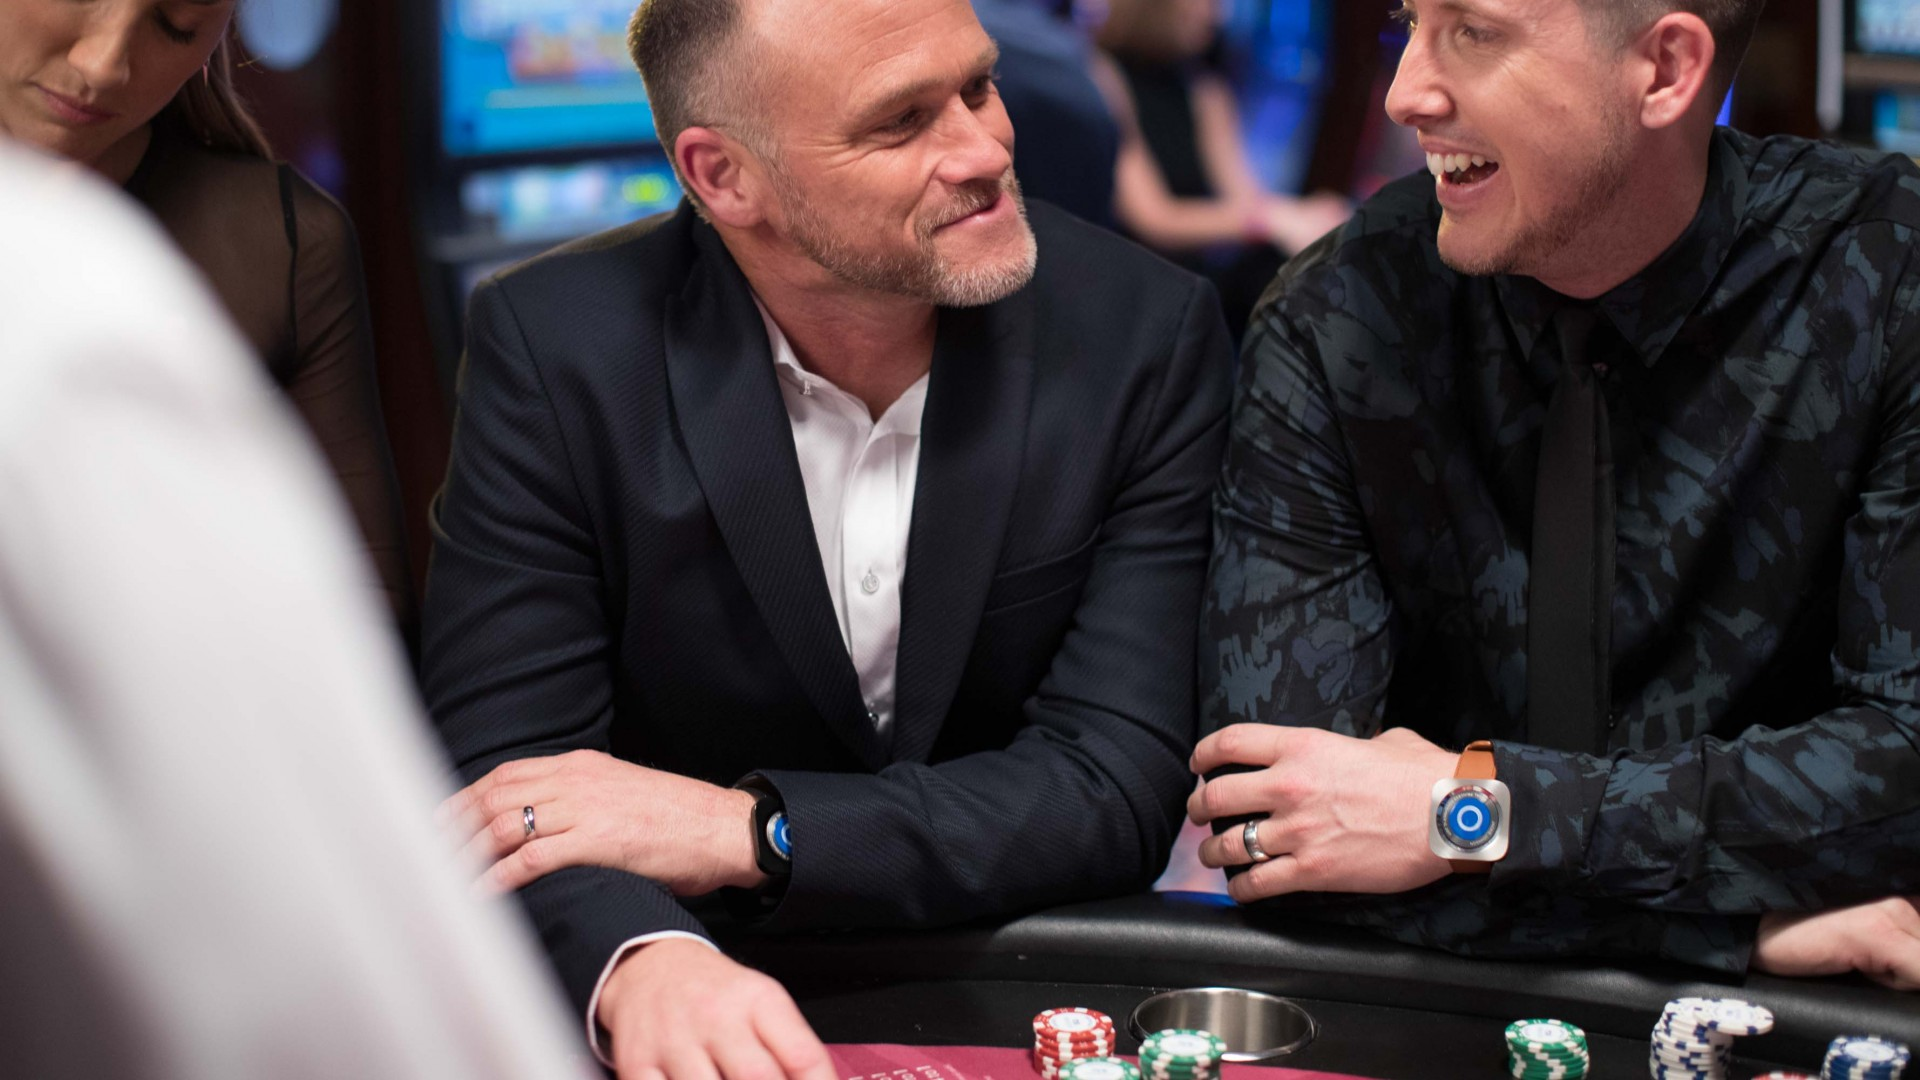 playocean-guests-in-casino